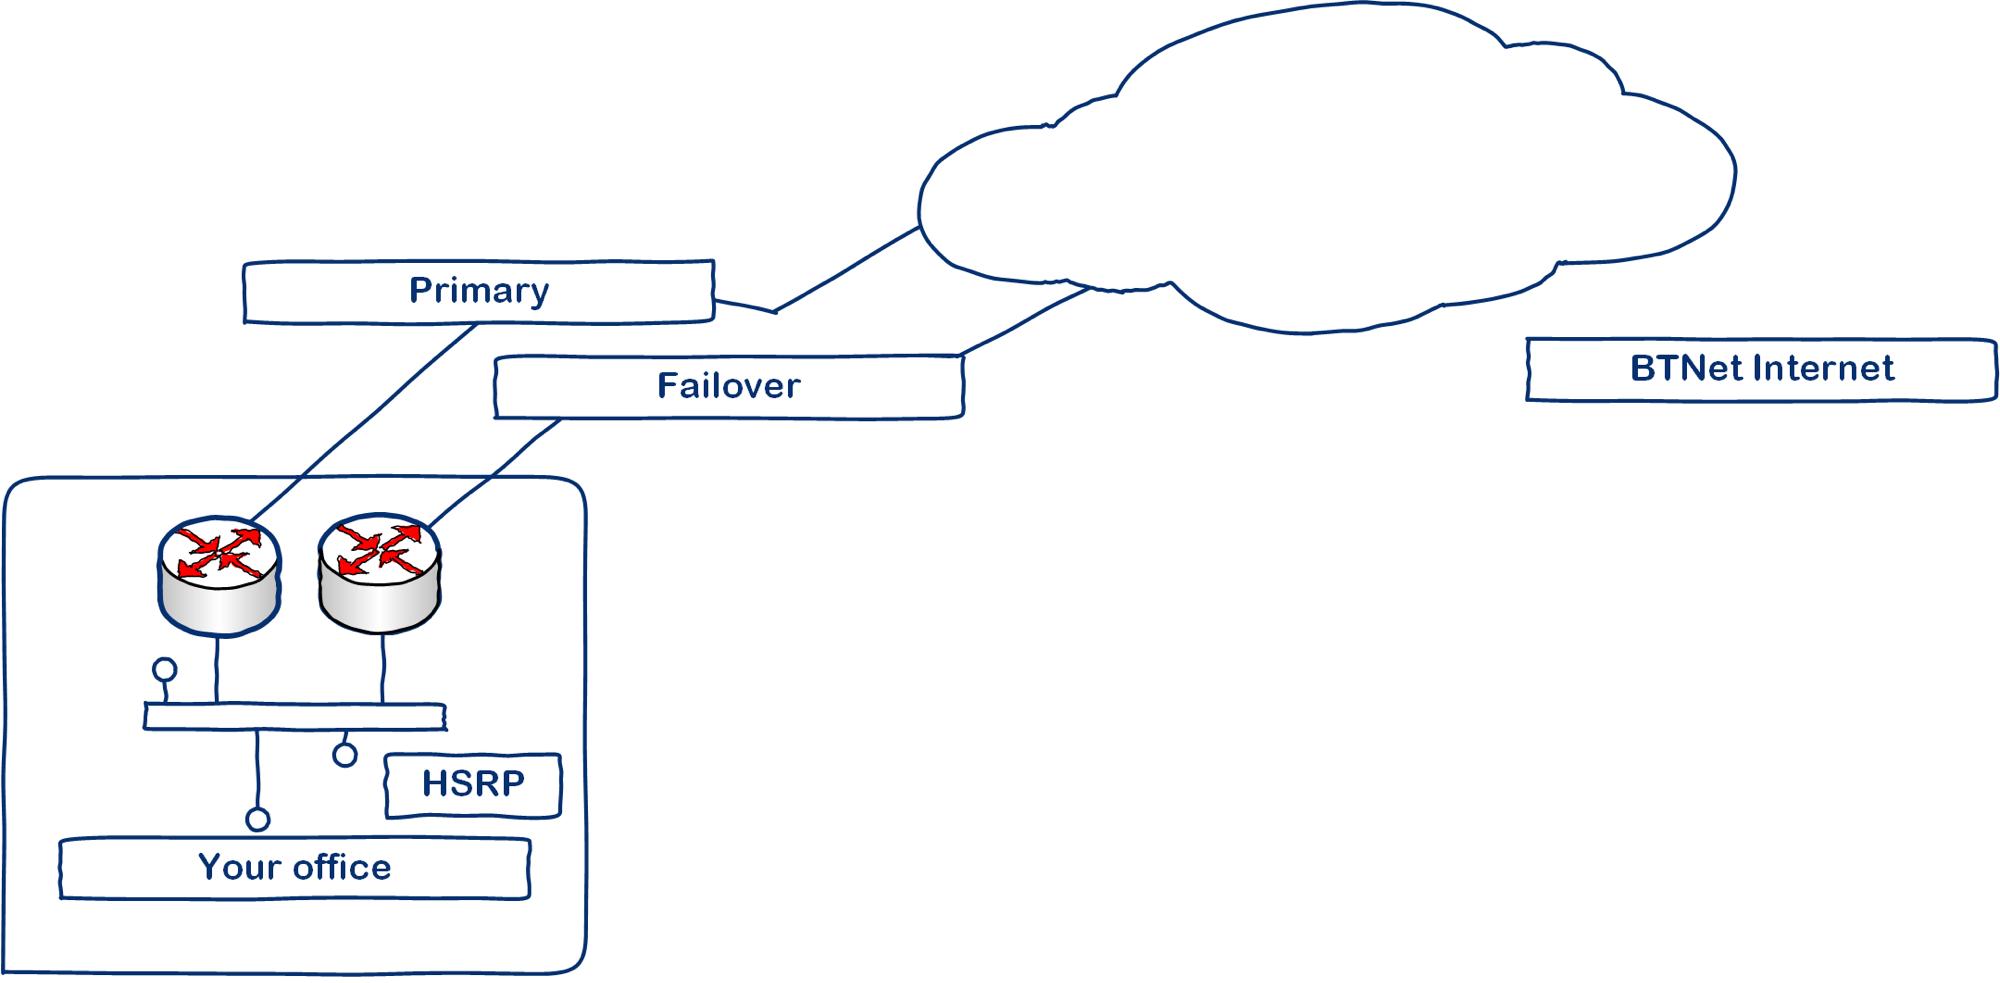 BTNet Failover design